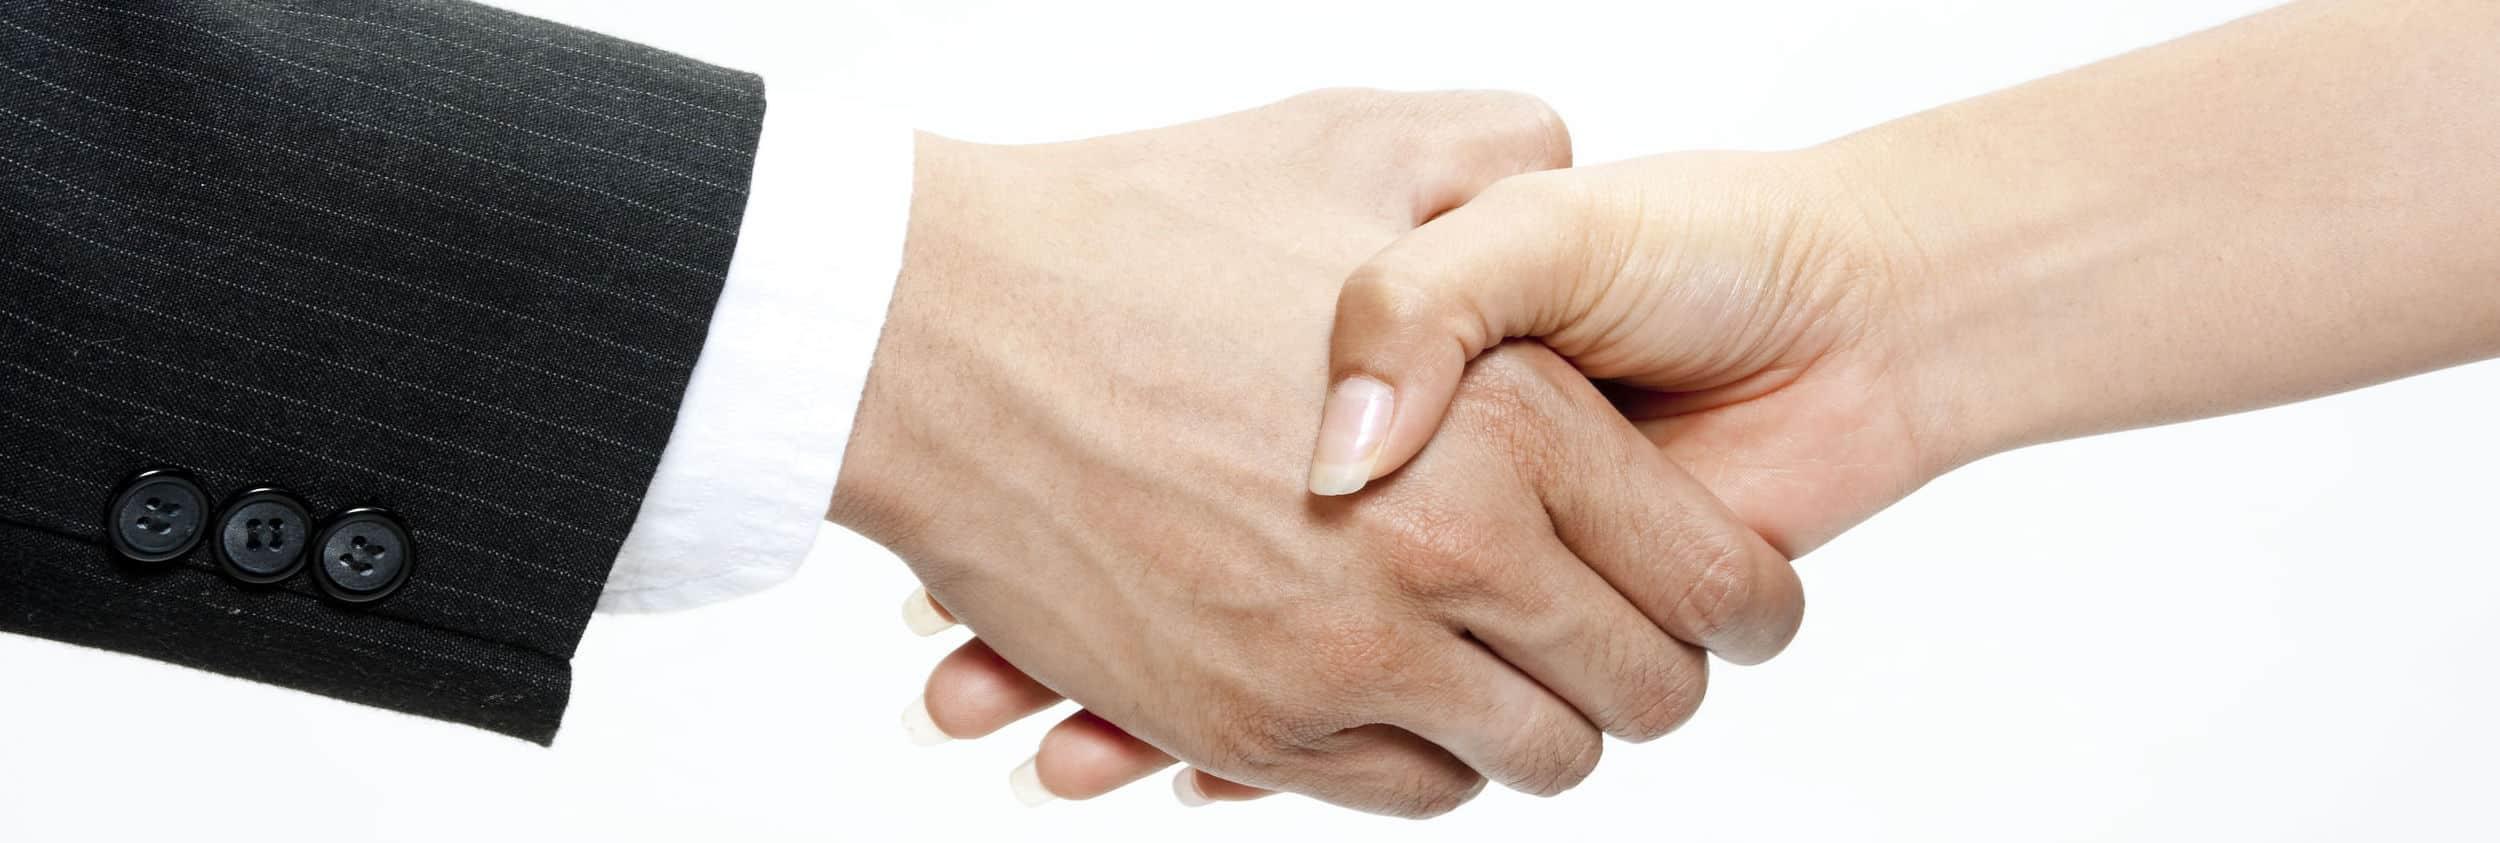 Atlanta web design shaking hands